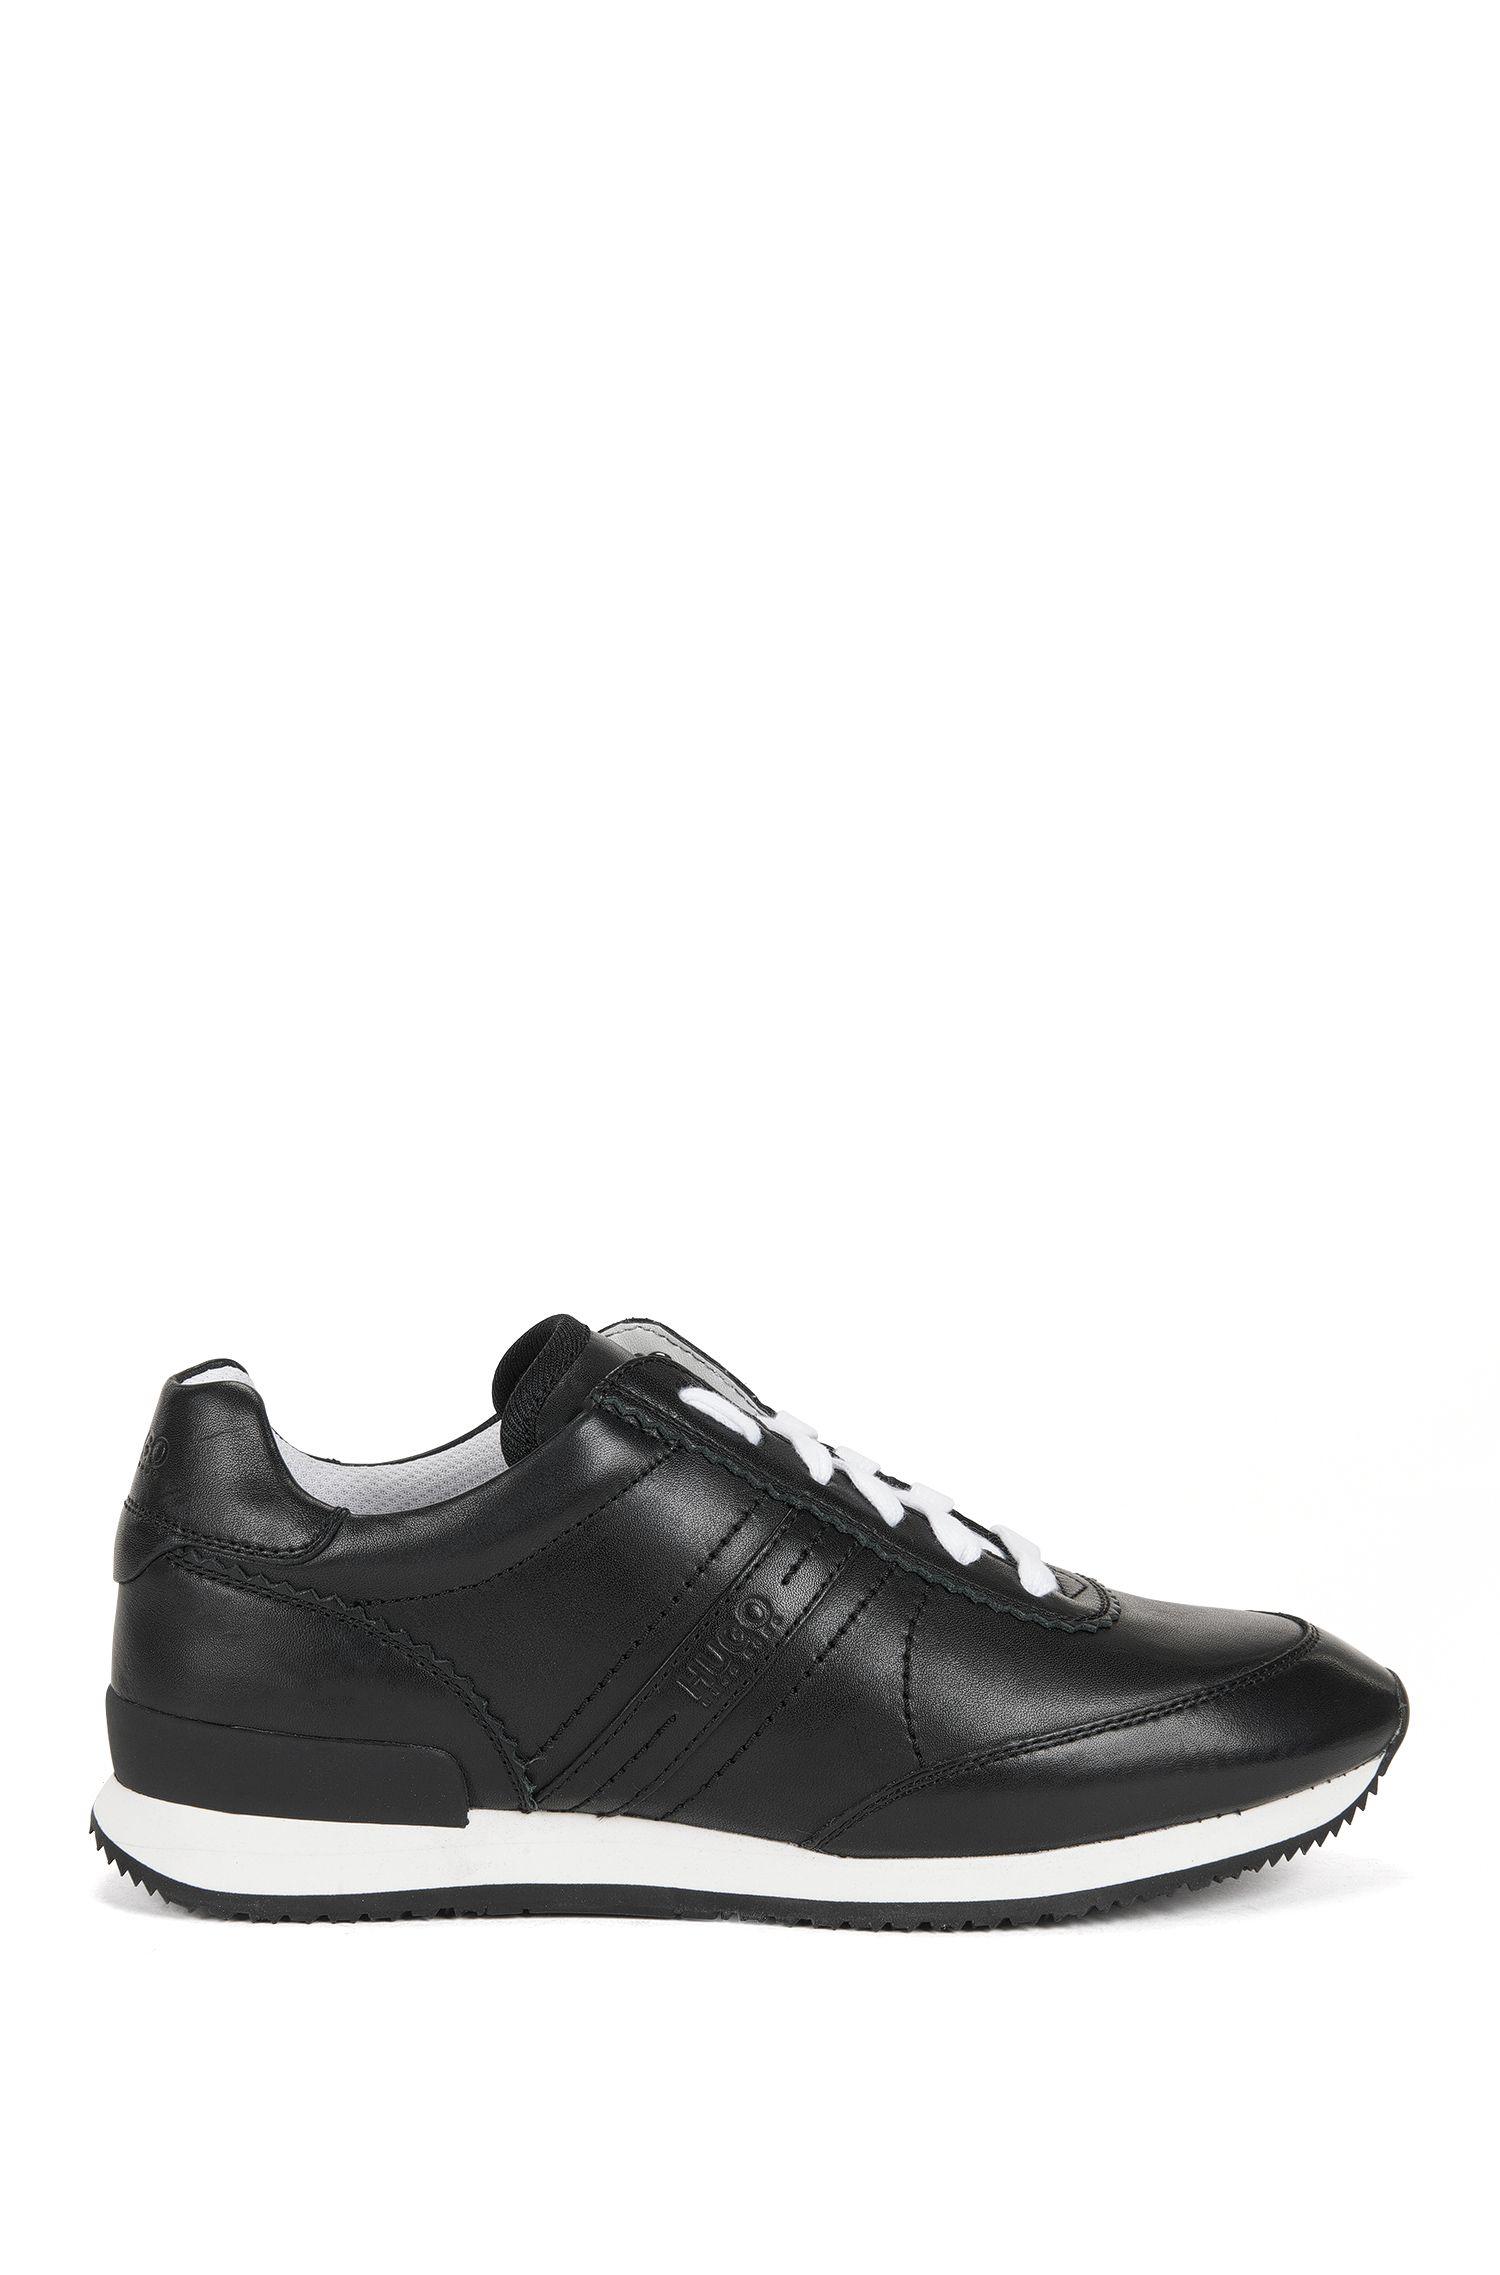 Sneakers aus Leder mit Gummisohle